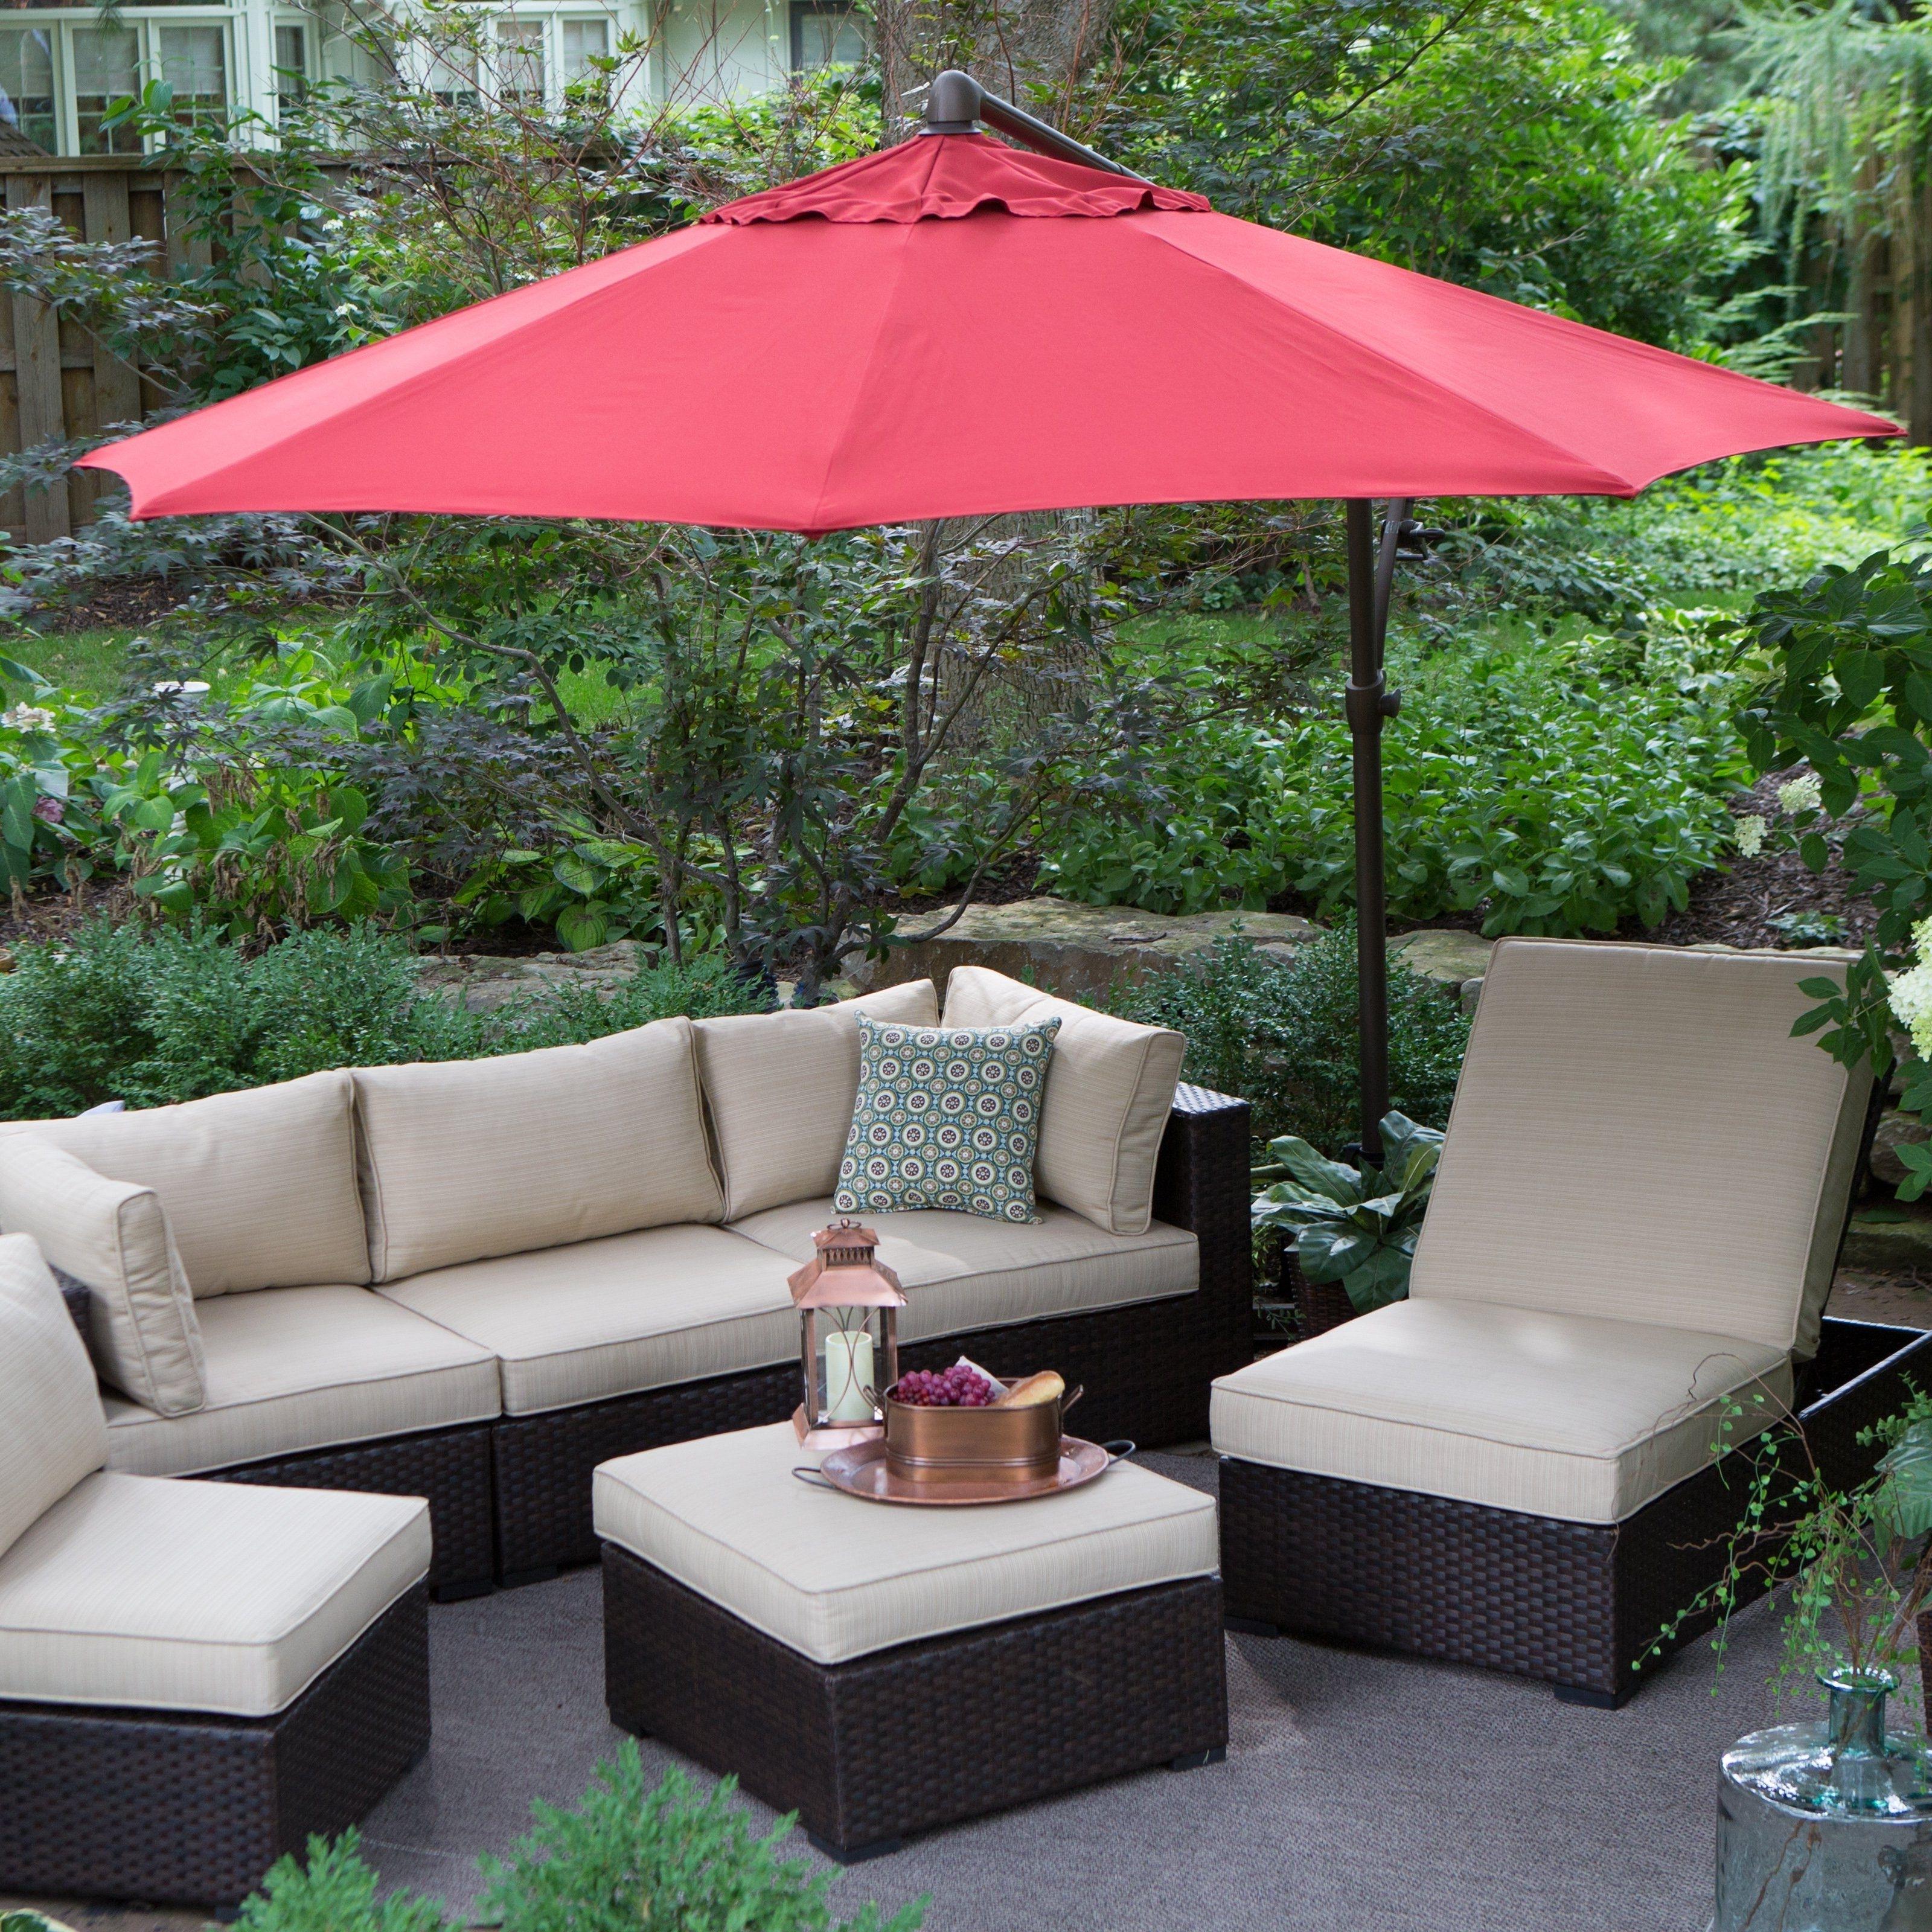 Trendy 10 Ft Patio Umbrellas Intended For Treasure Garden 10 Ft (View 16 of 20)